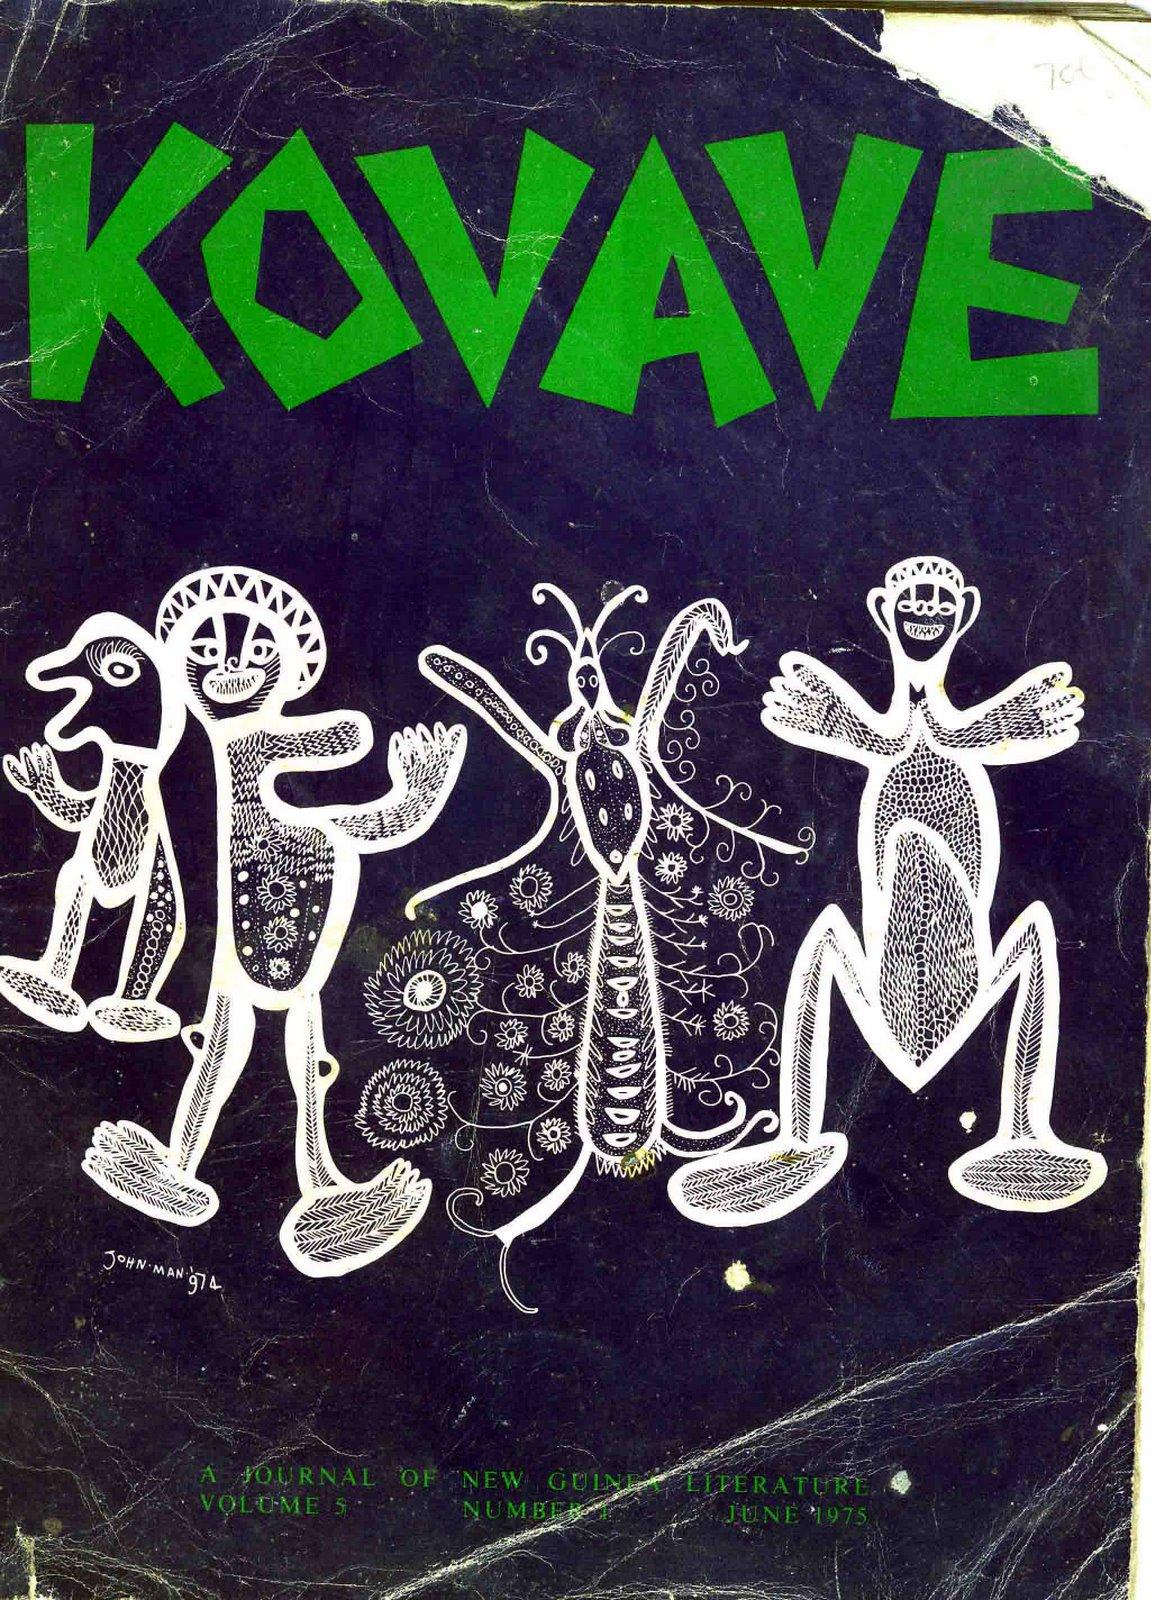 http://3.bp.blogspot.com/_Iro6AankEEI/R09mYnJ_9QI/AAAAAAAAAIc/Tc21RoAu1AQ/s1600-R/Kovave,+June+1975.jpg